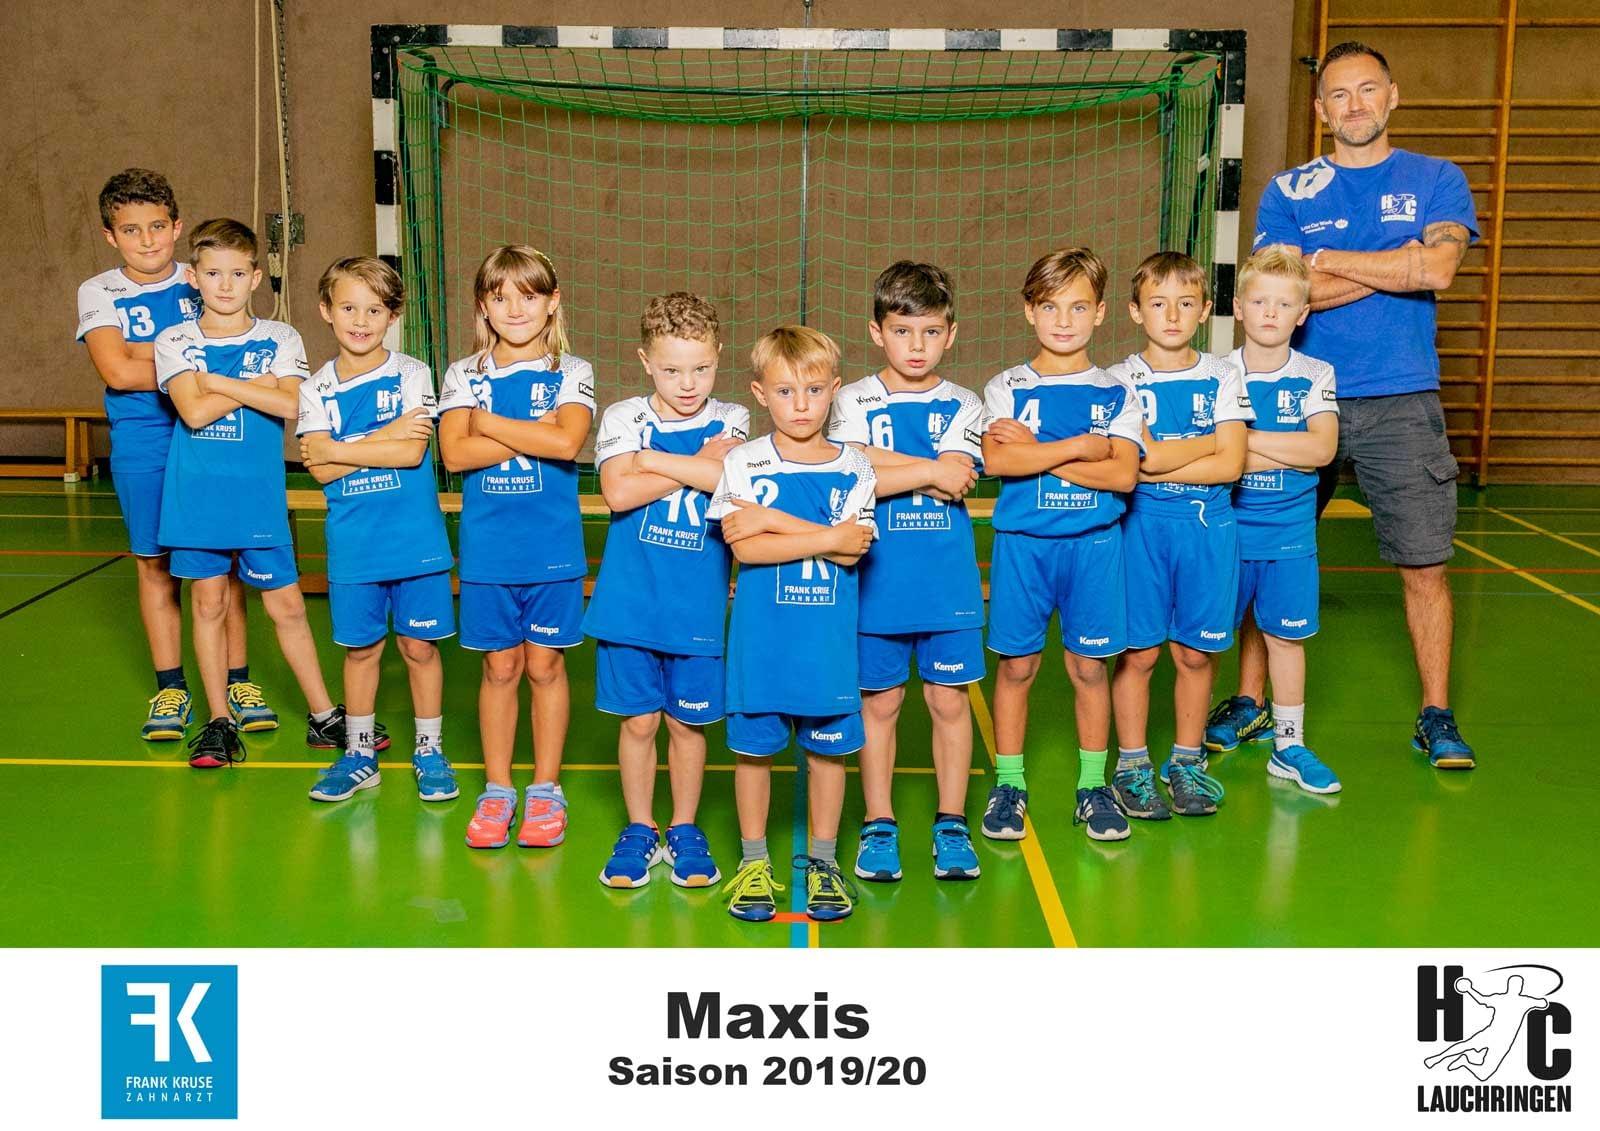 Maxis HC Lauchringen